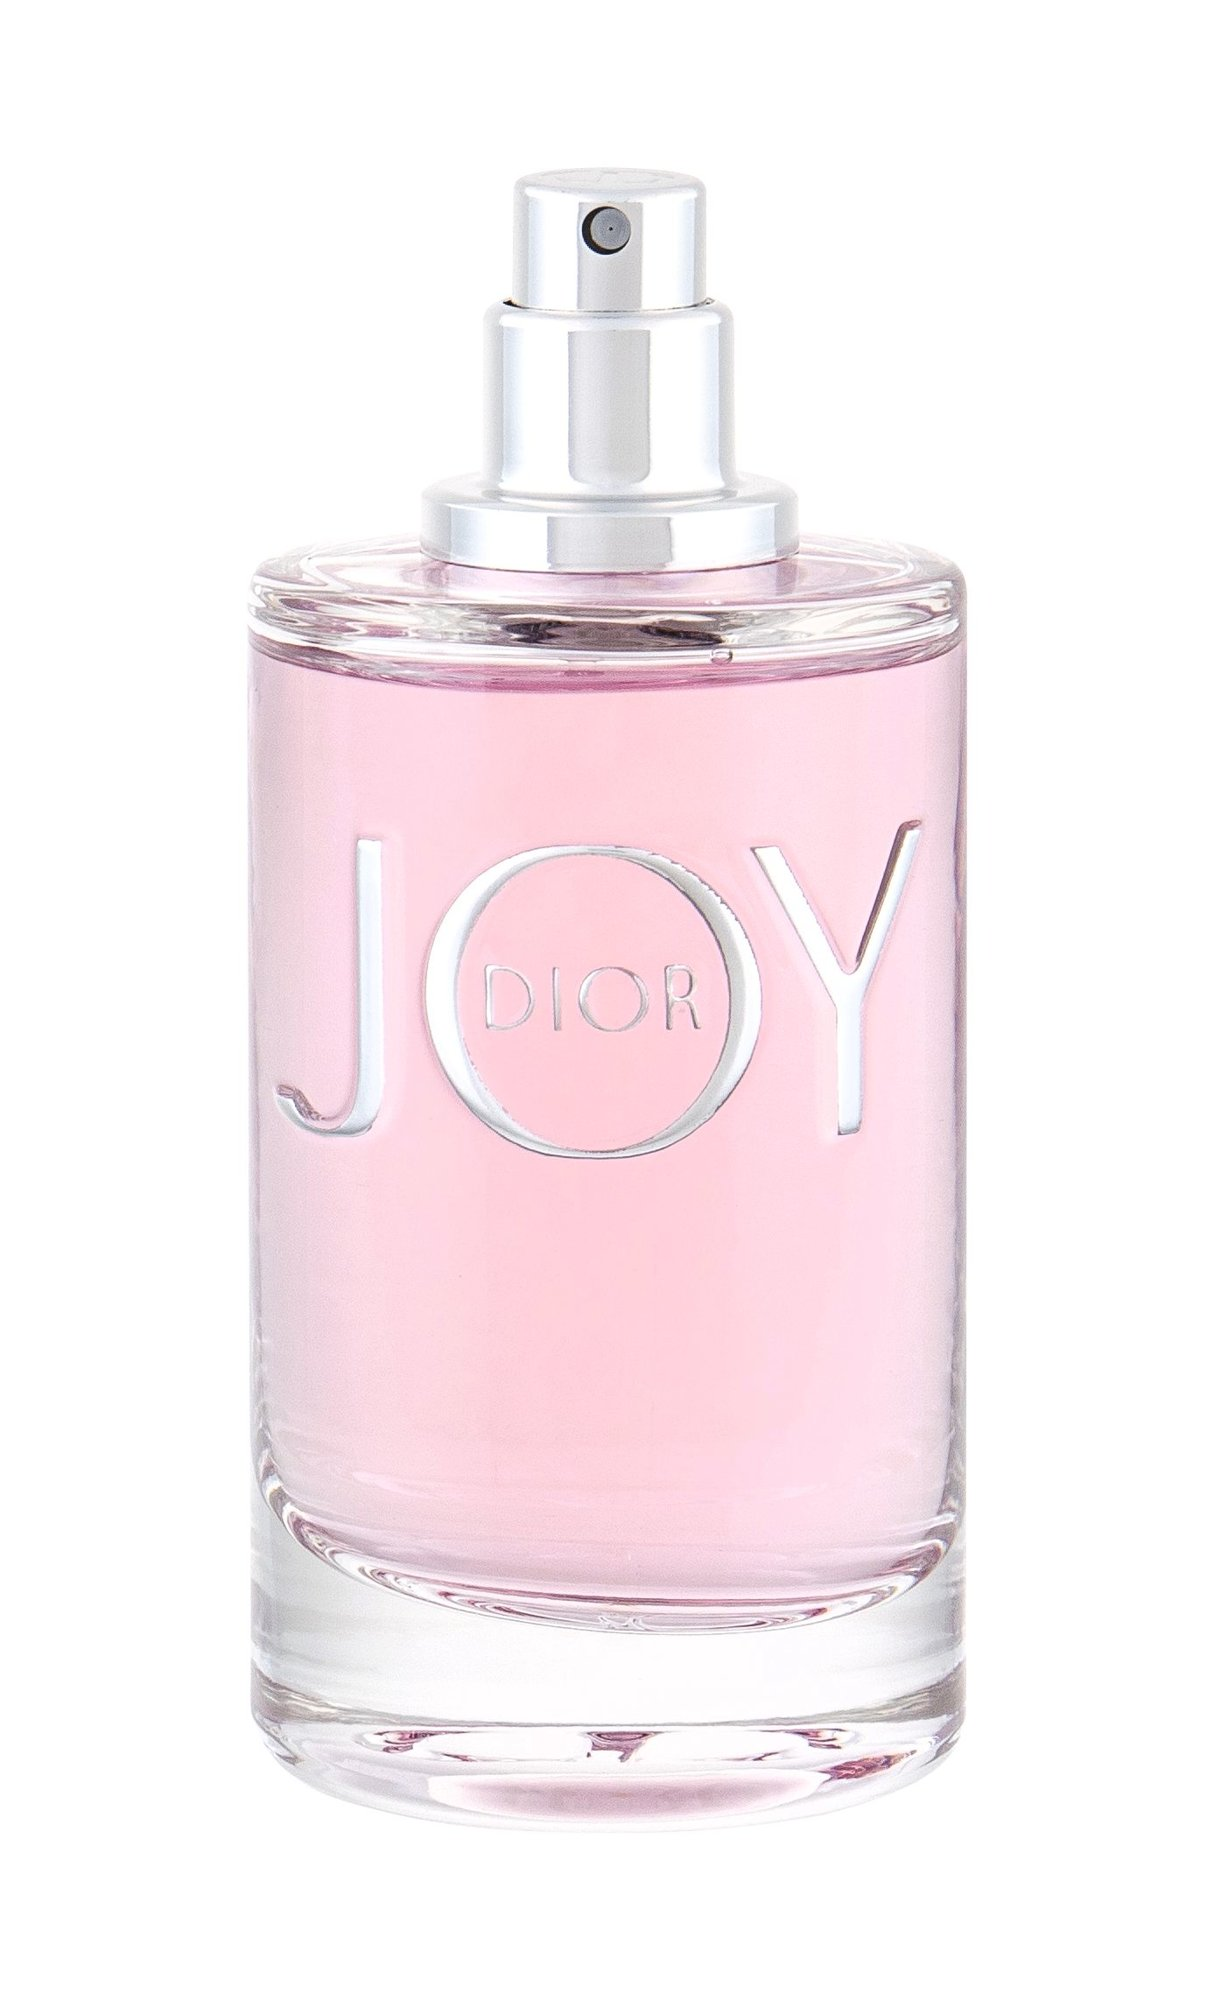 Christian Dior Joy by Dior Eau de Parfum 50ml